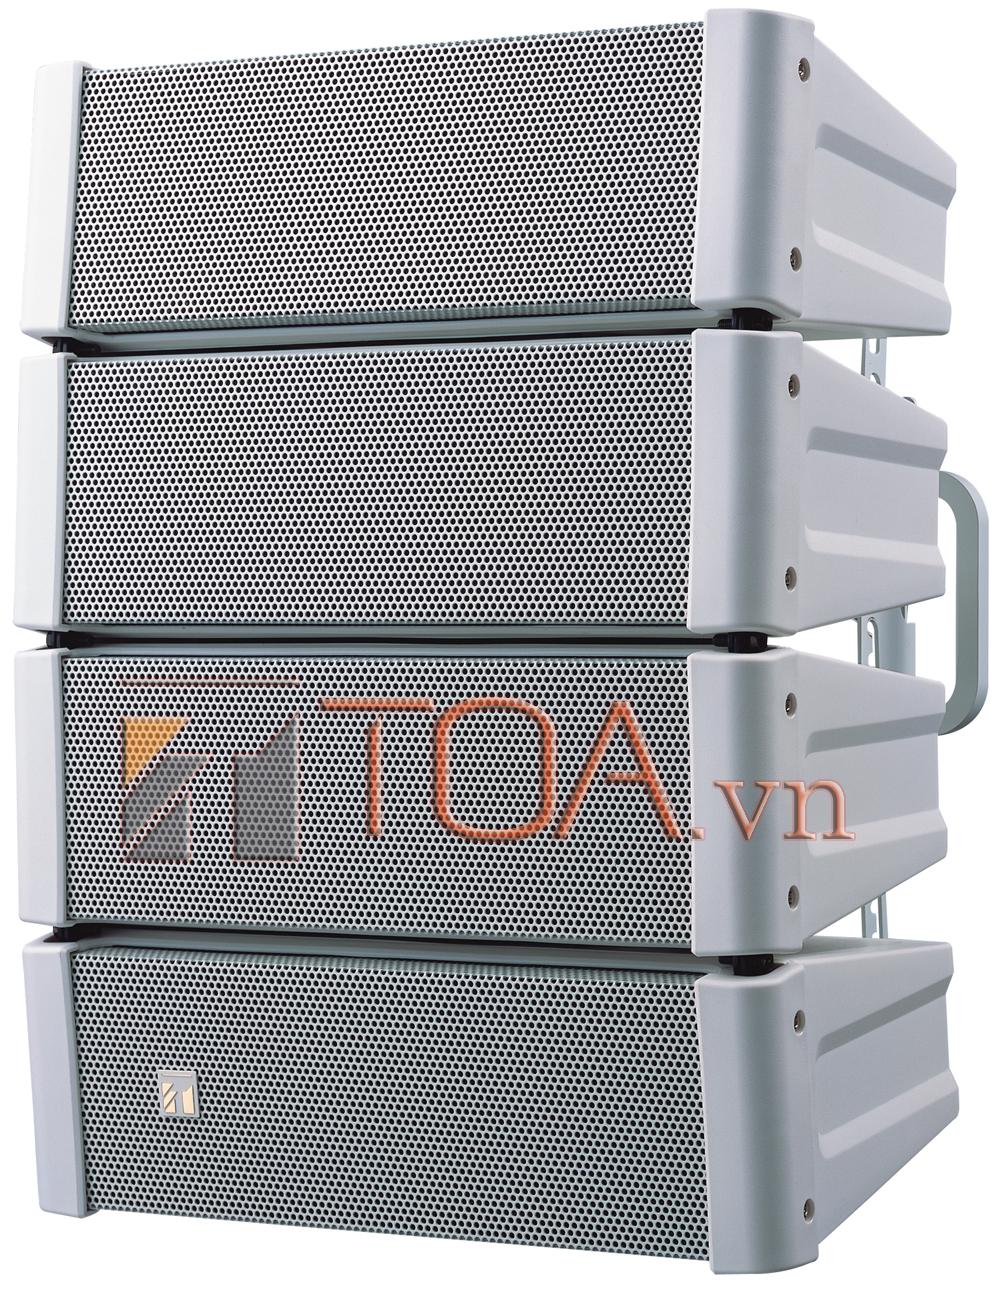 TOA HX-5W : SPEAKER SYSTEM, SẢN PHẨM TOA HX-5W